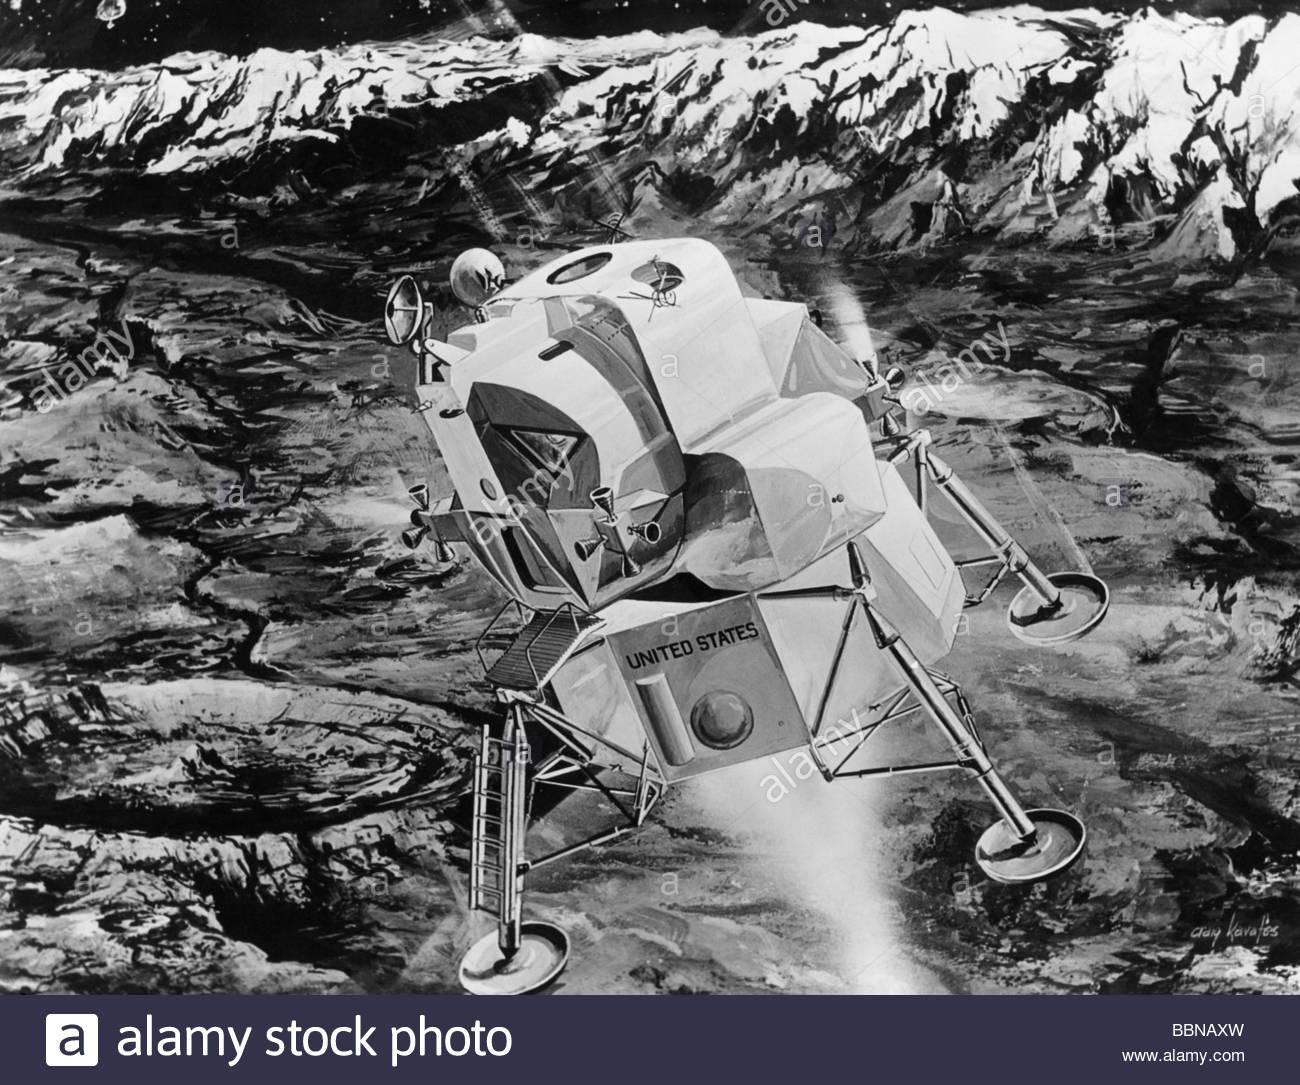 drawing apollo 11 moon lander - photo #13